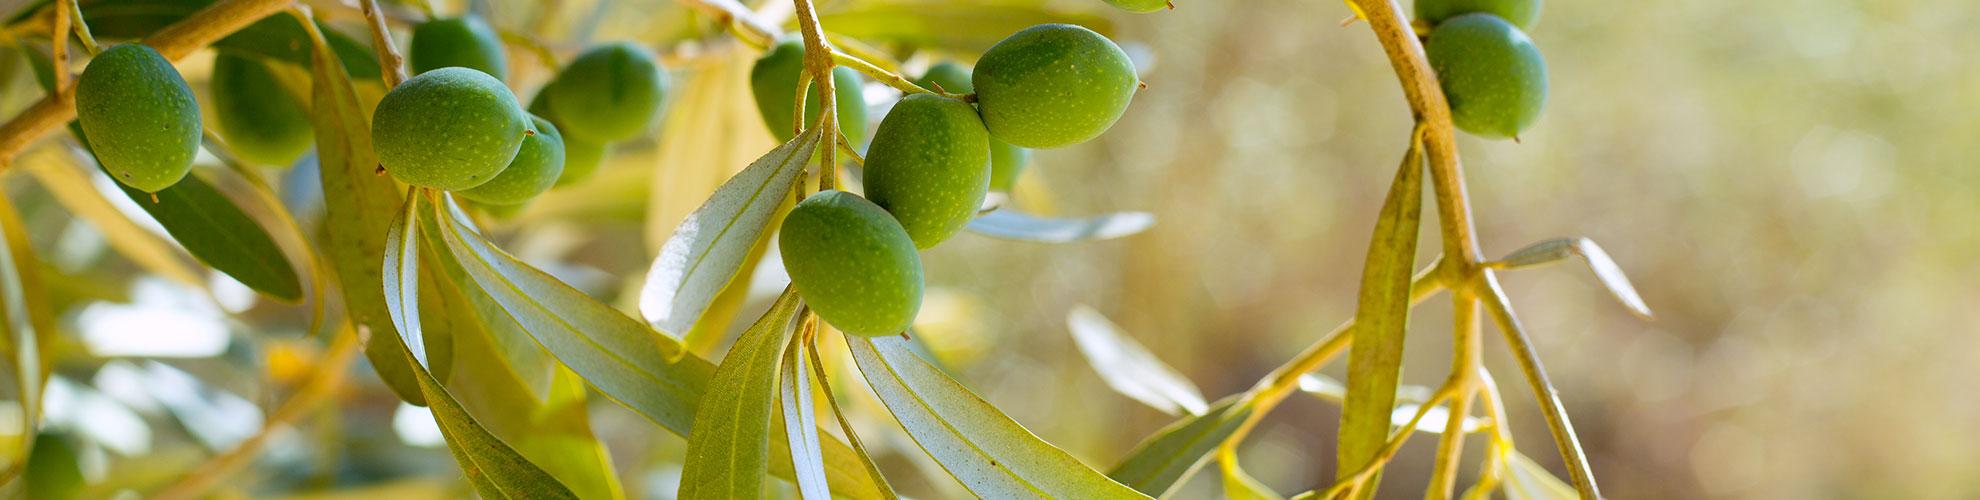 olive_calabresi